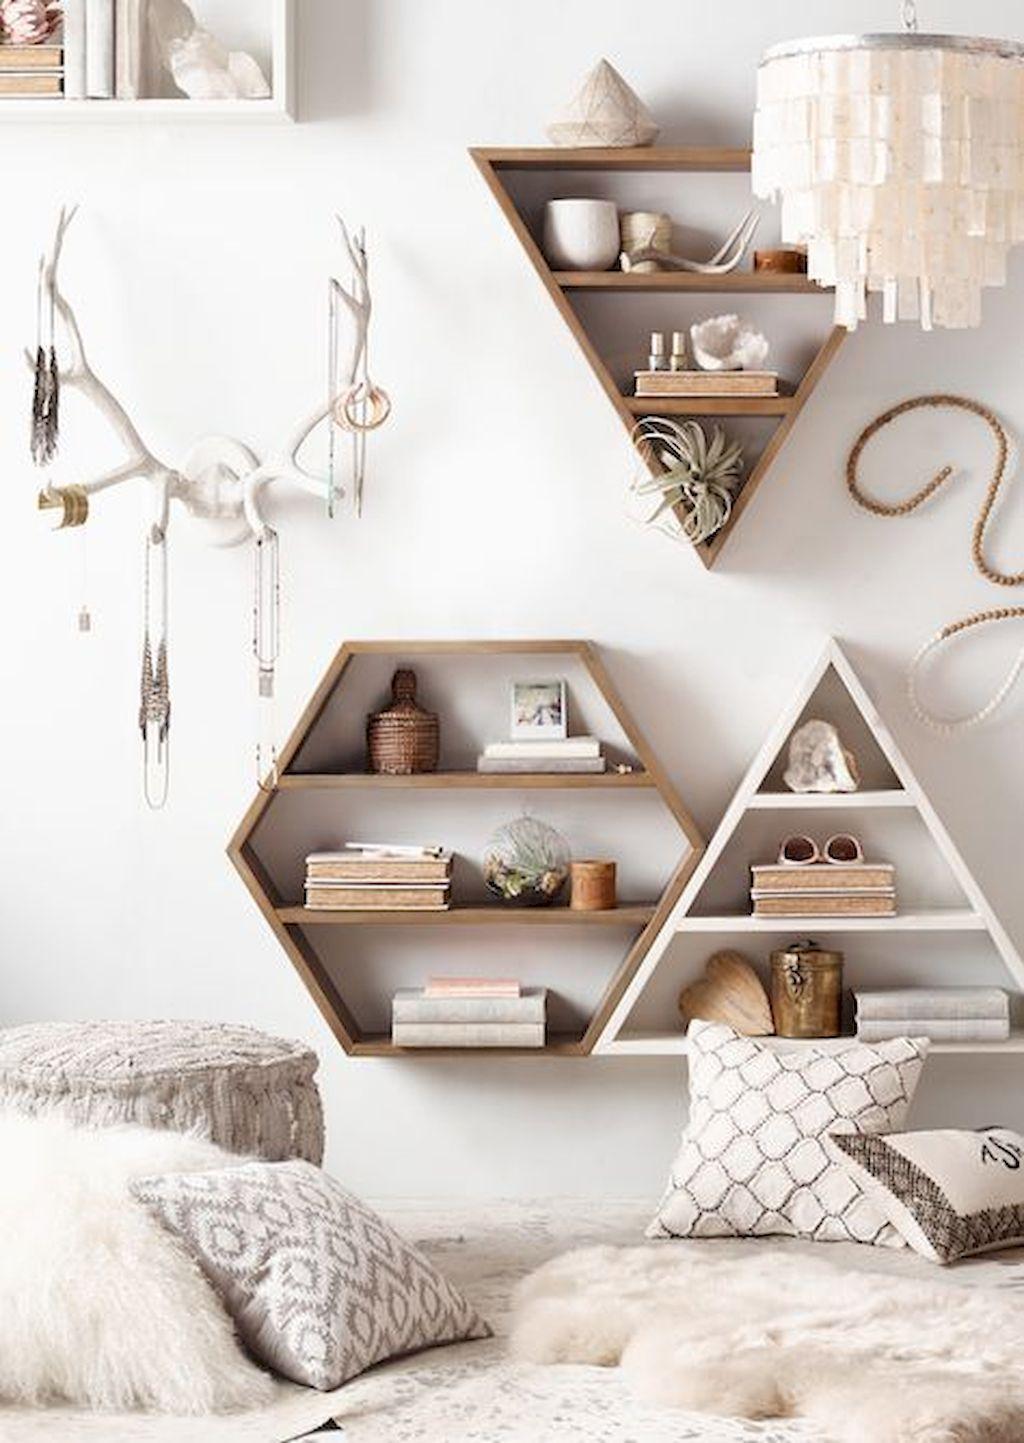 40 Creative And Cute Diy Dorm Room Decorating Ideas Homeastern Com Bohemian Bedroom Inspiration Retro Home Decor Modern Bohemian Bedroom